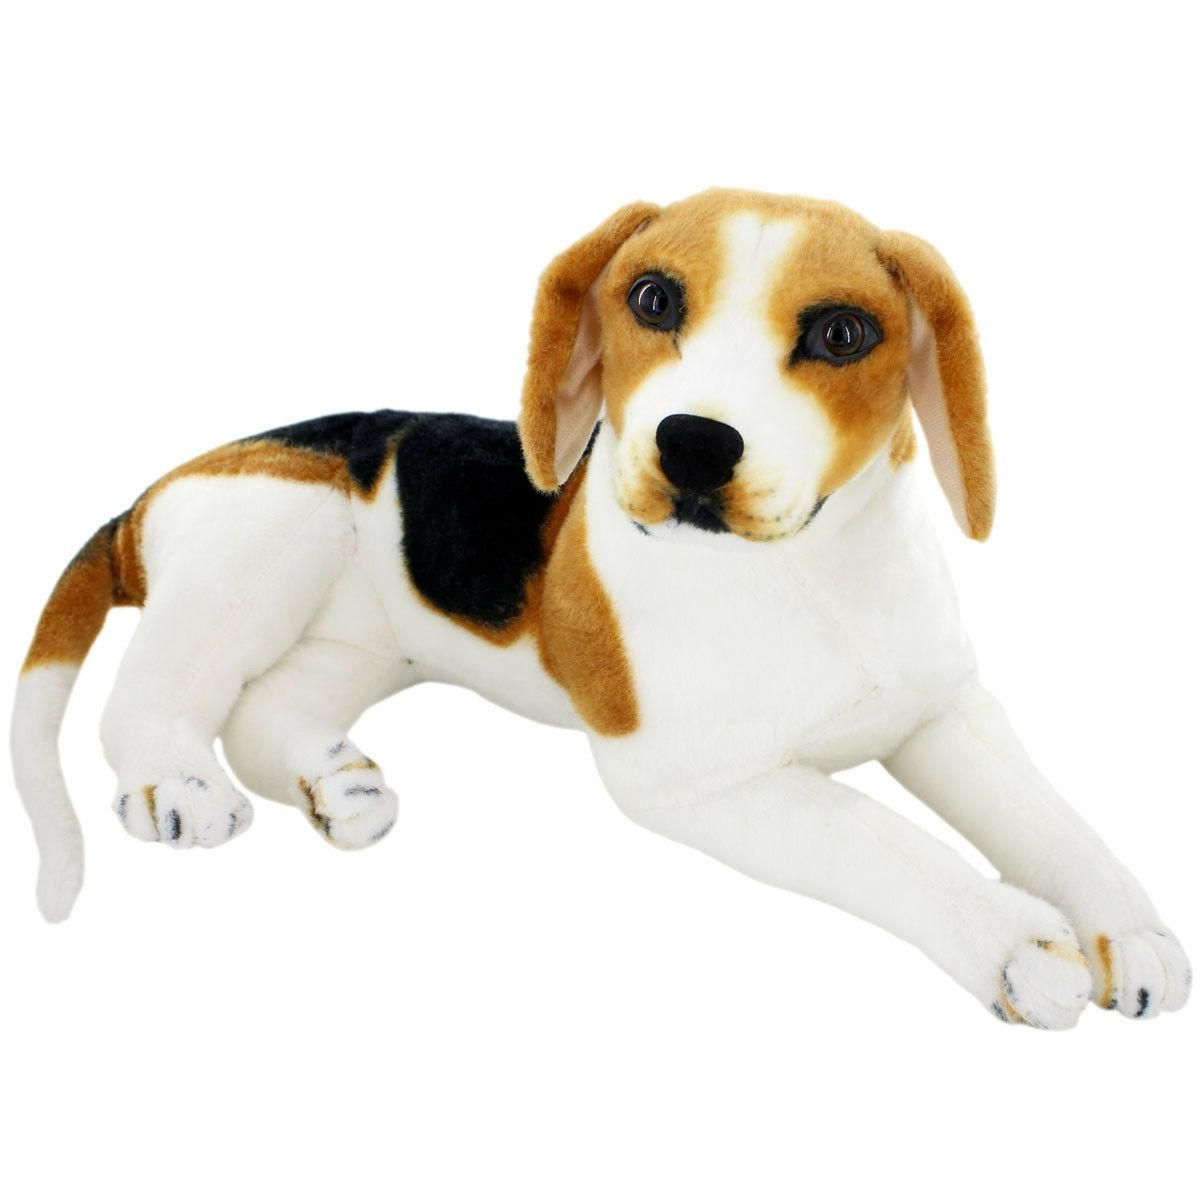 giant realistic stuffed animals beagle